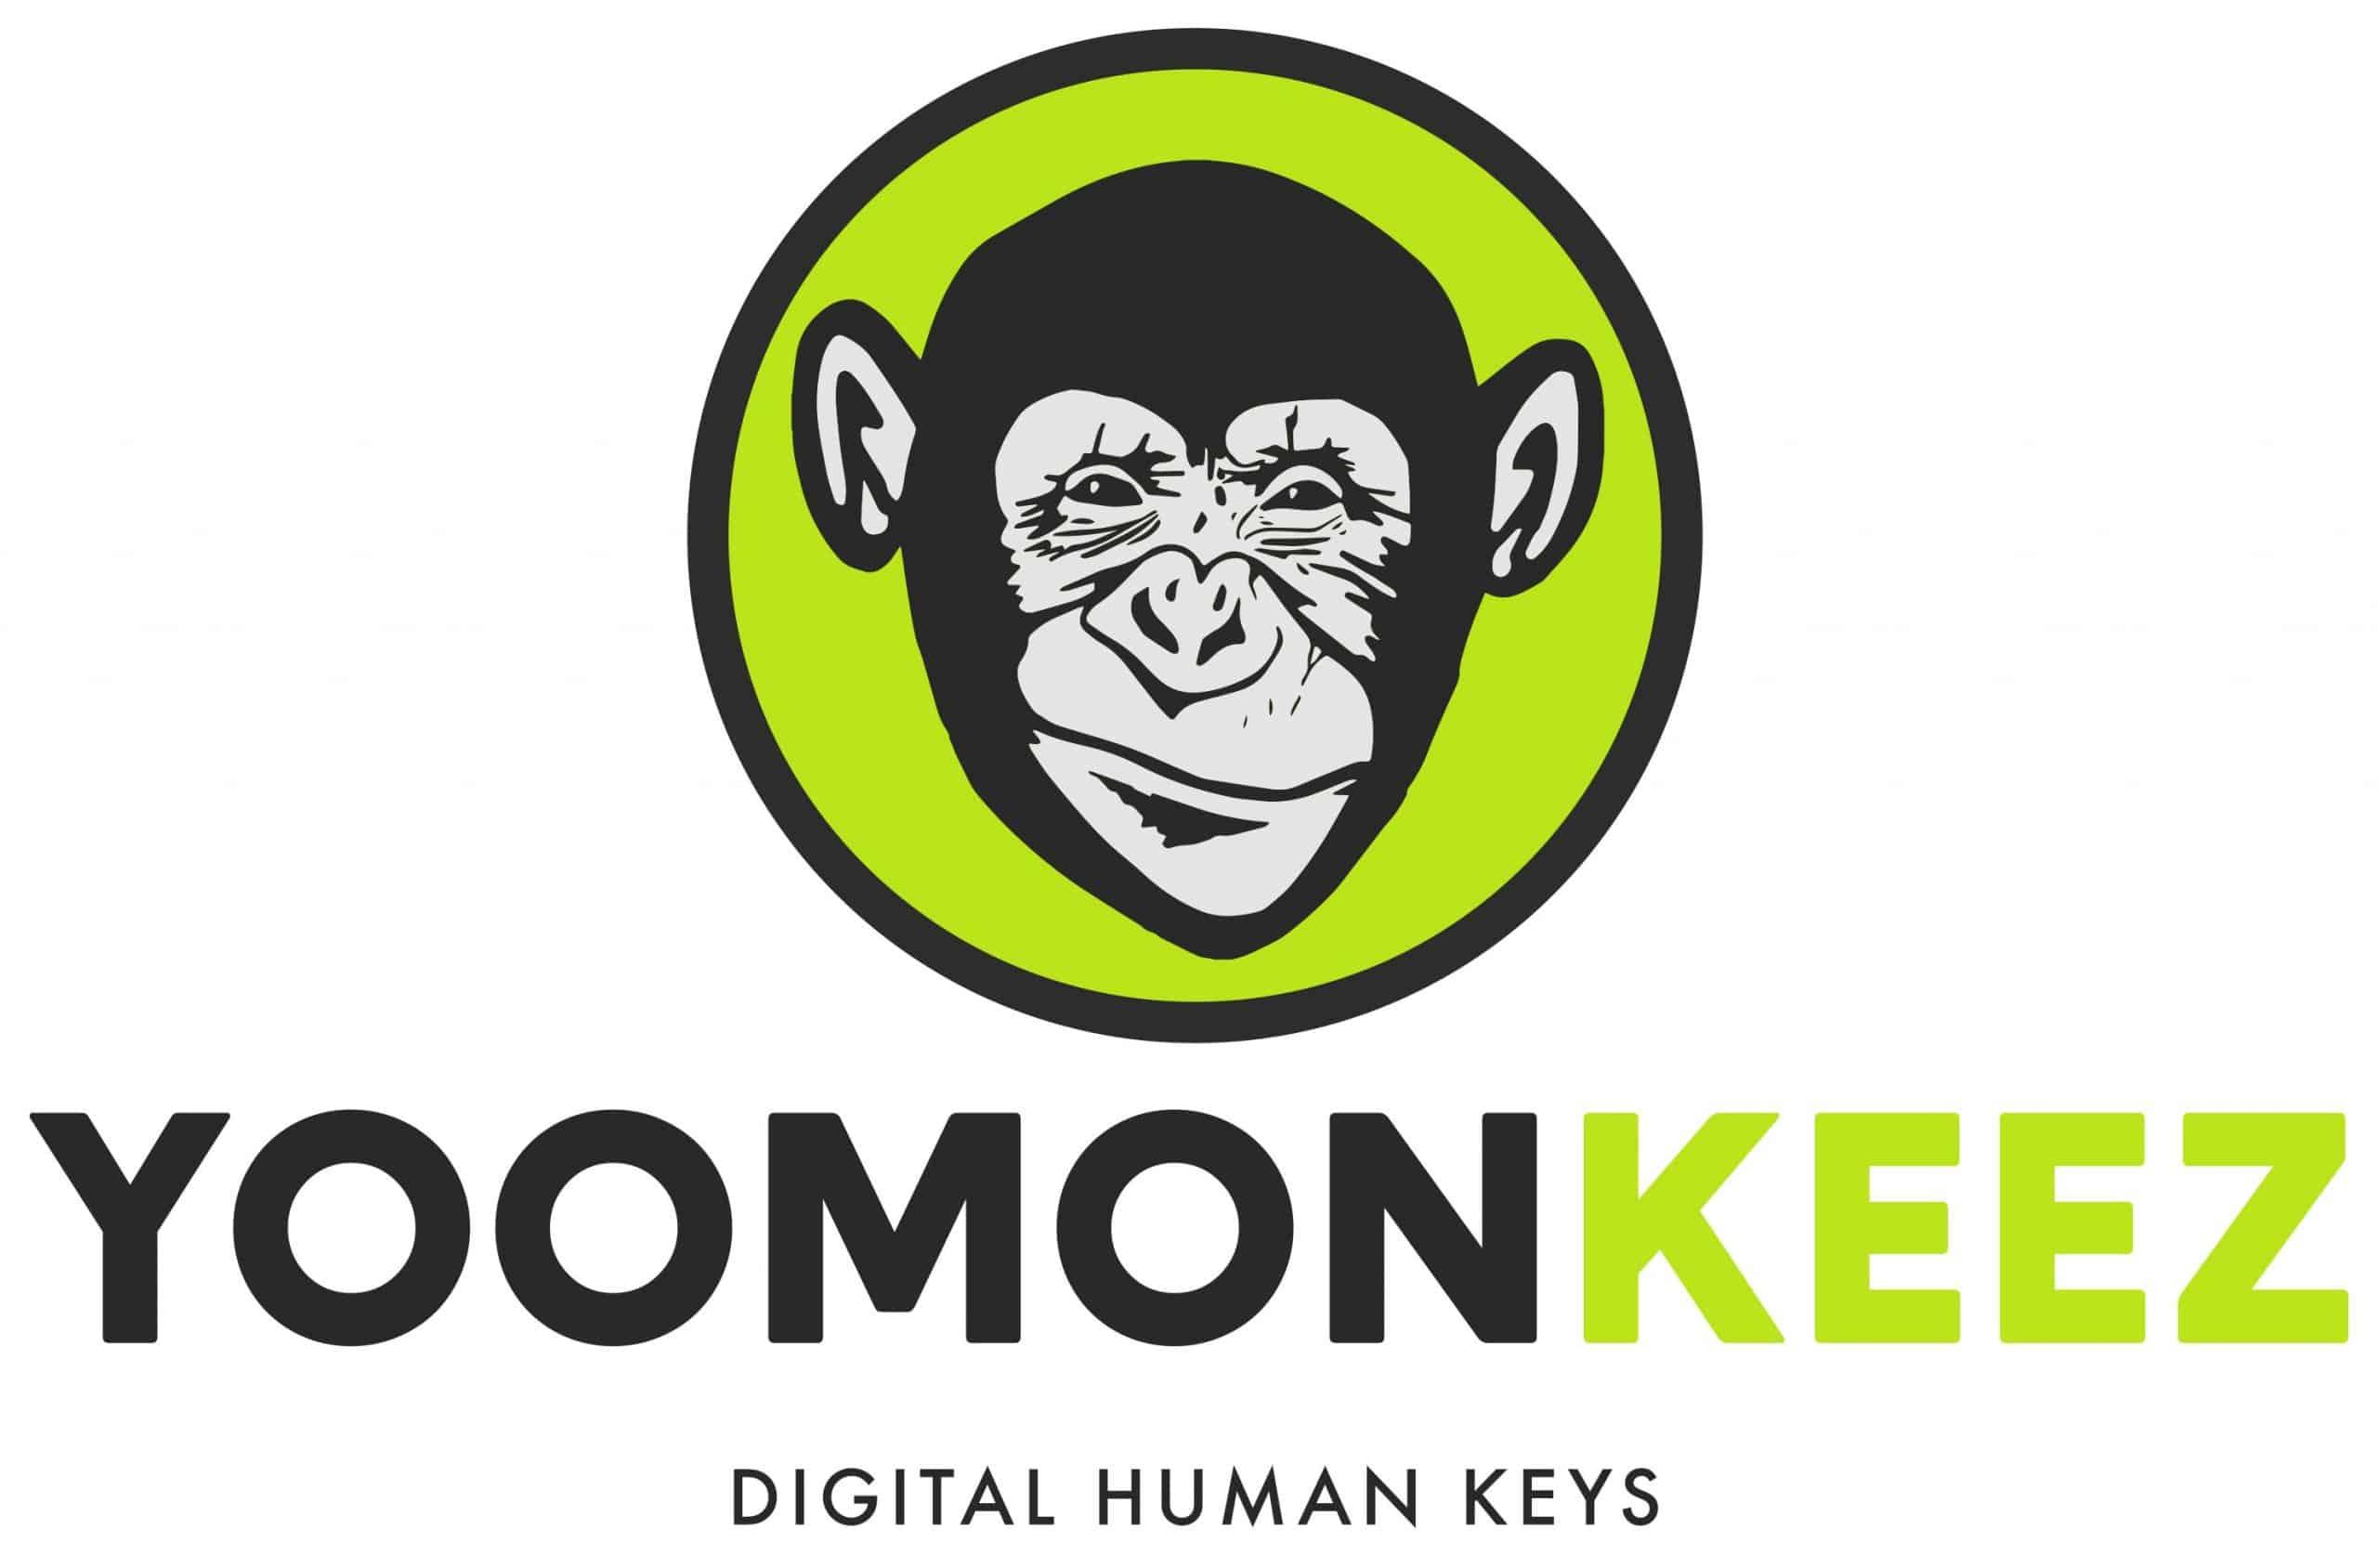 Logo de Yoomonkeez